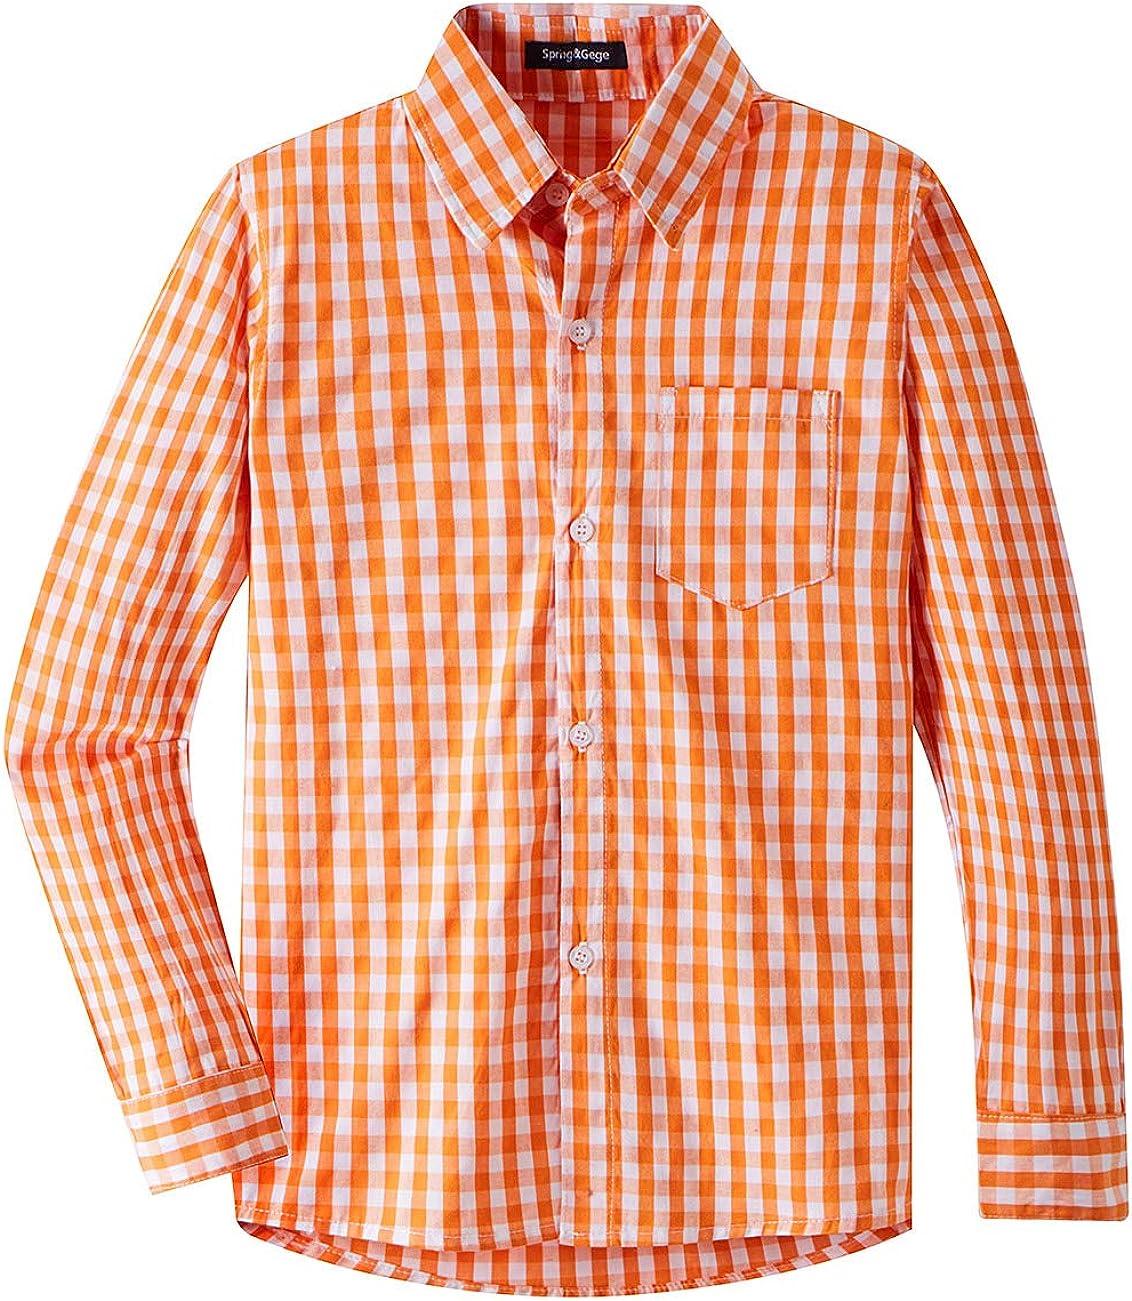 Spring&Gege Boys' Long Sleeve Plaid Poplin Button Down Shirt